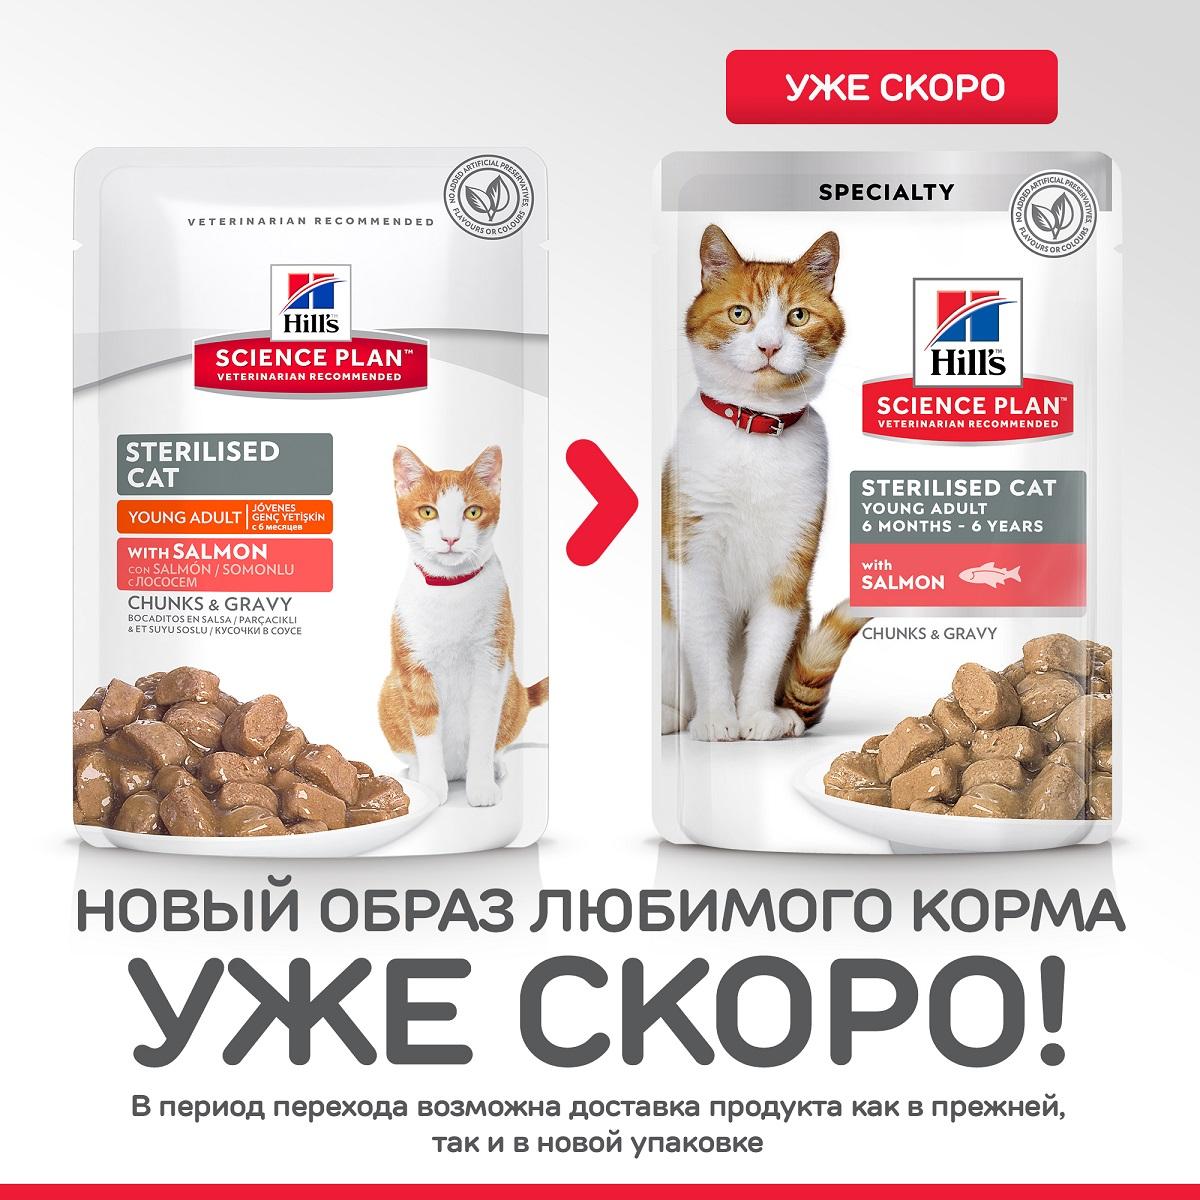 Hill's Science Plan Sterilised Cat Лосось 85гр 60297